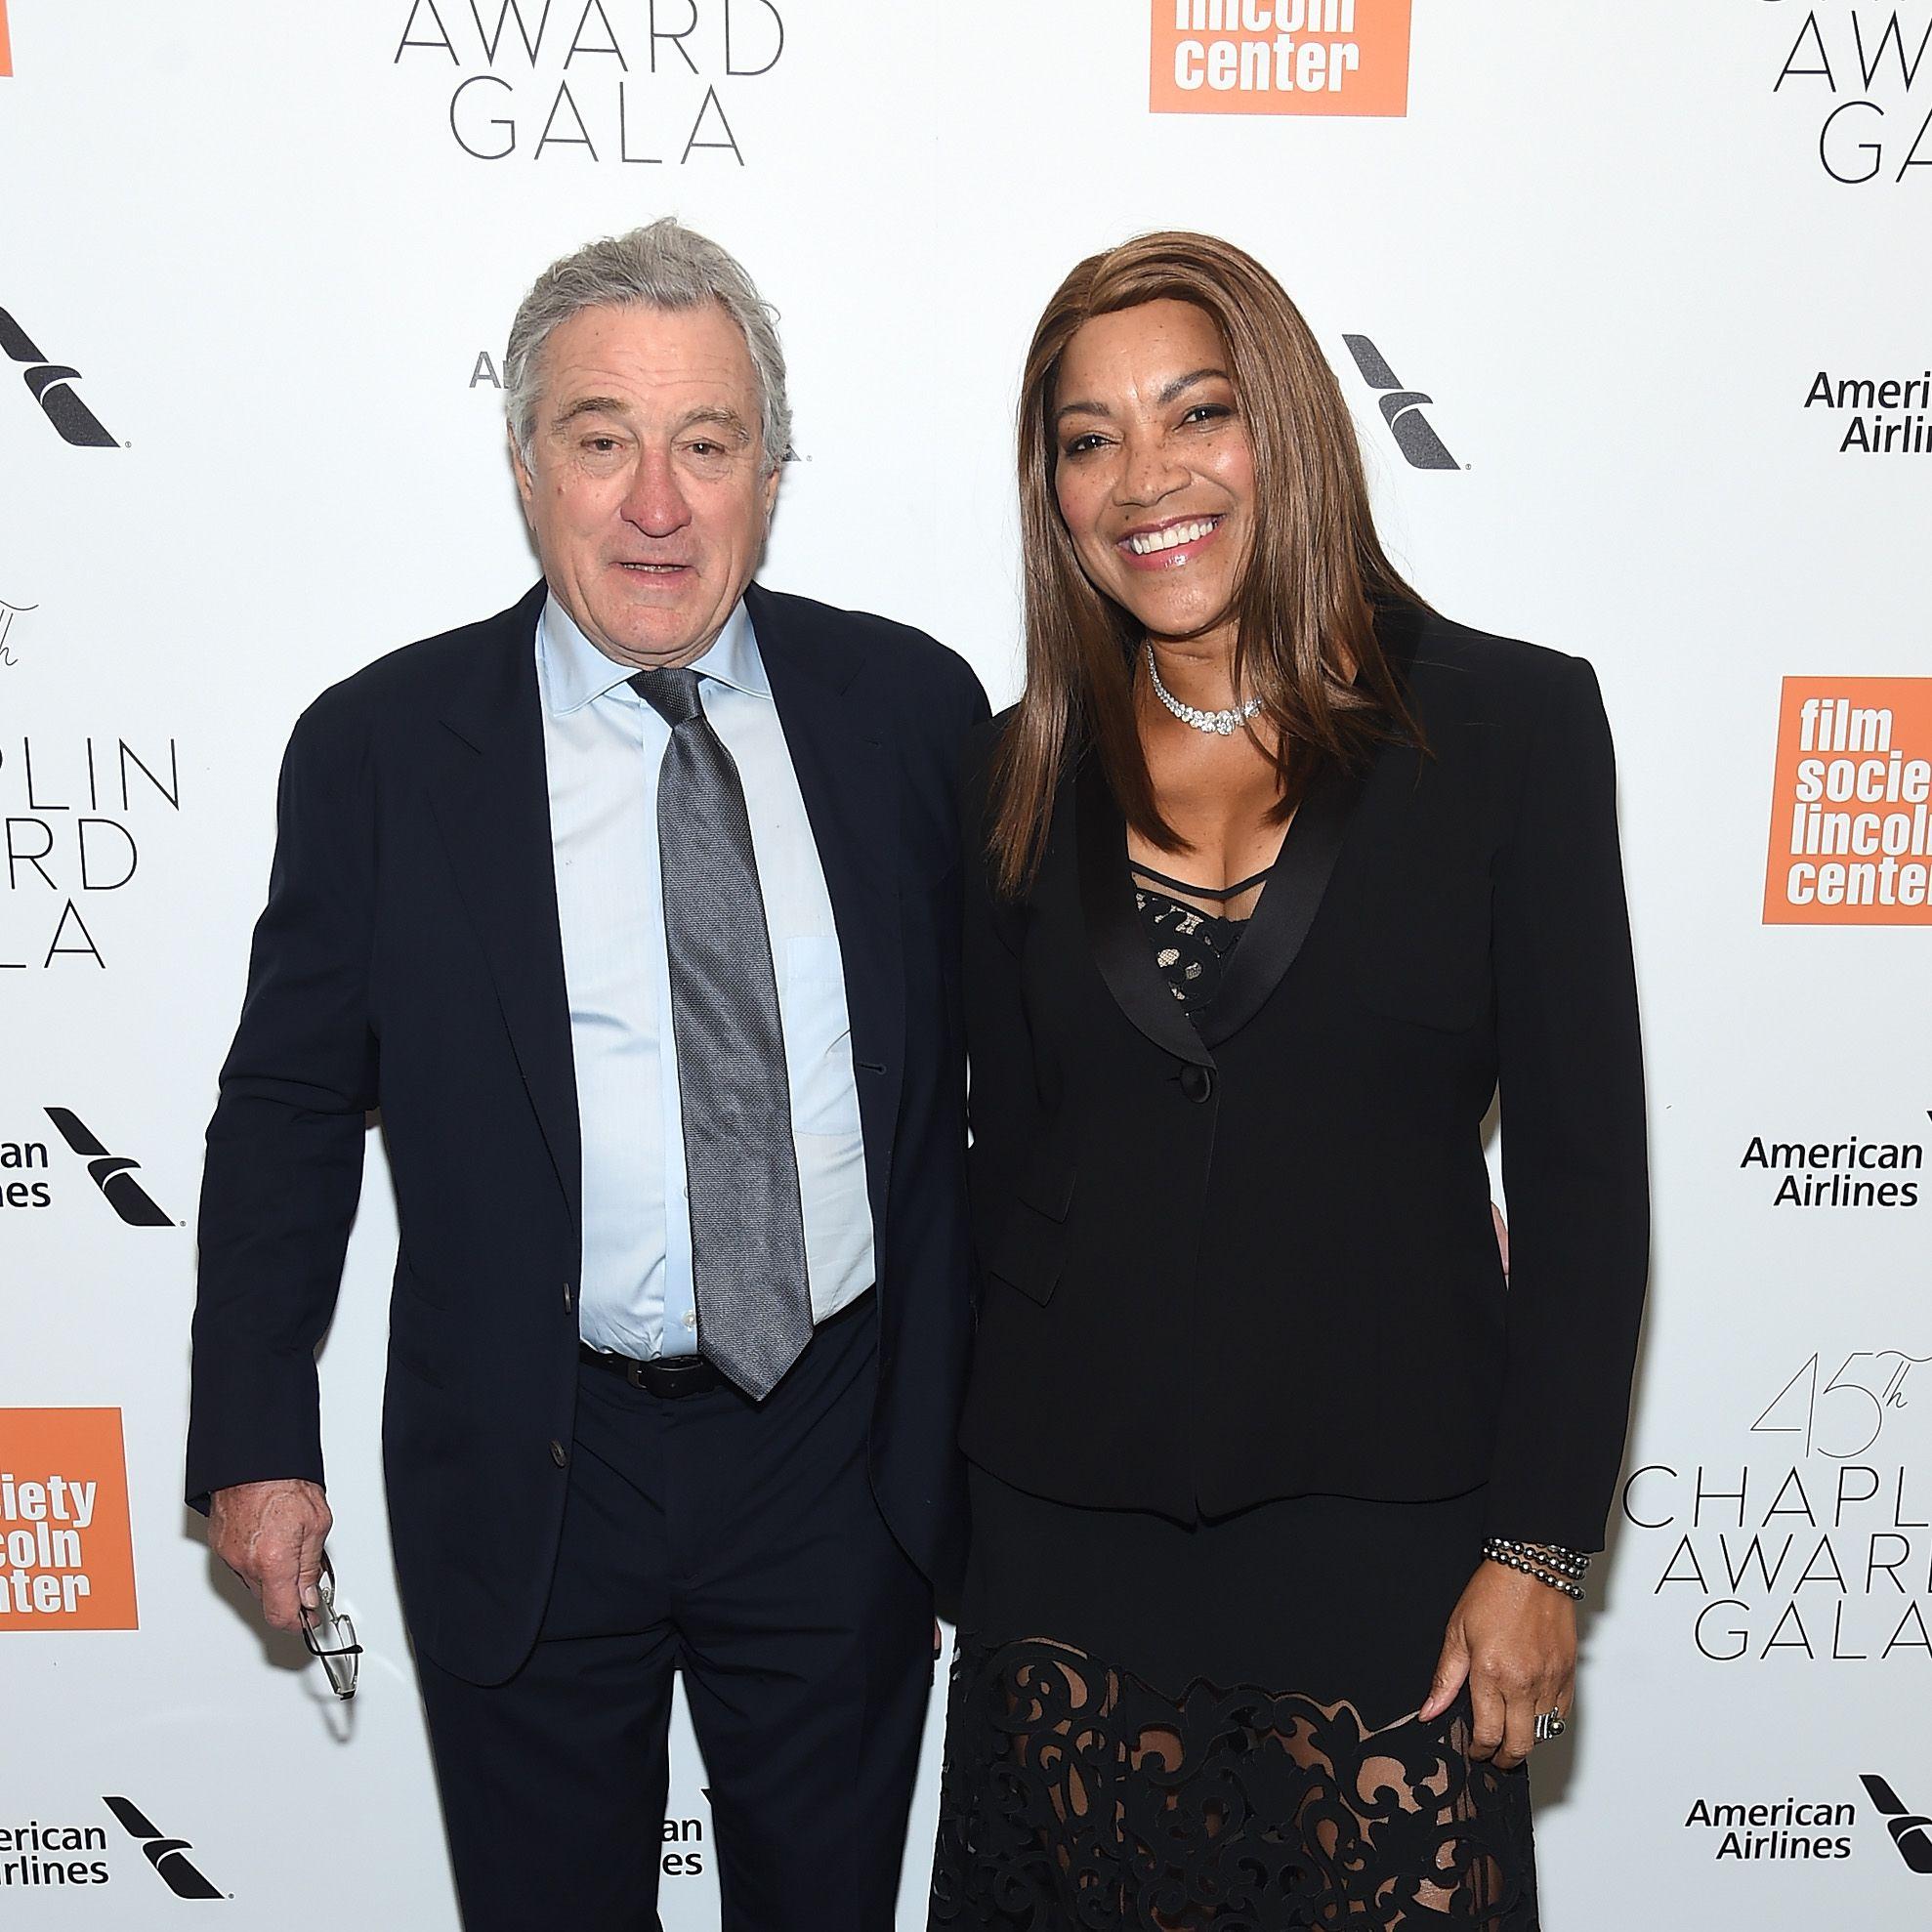 45th Chaplin Award Gala - Dinner